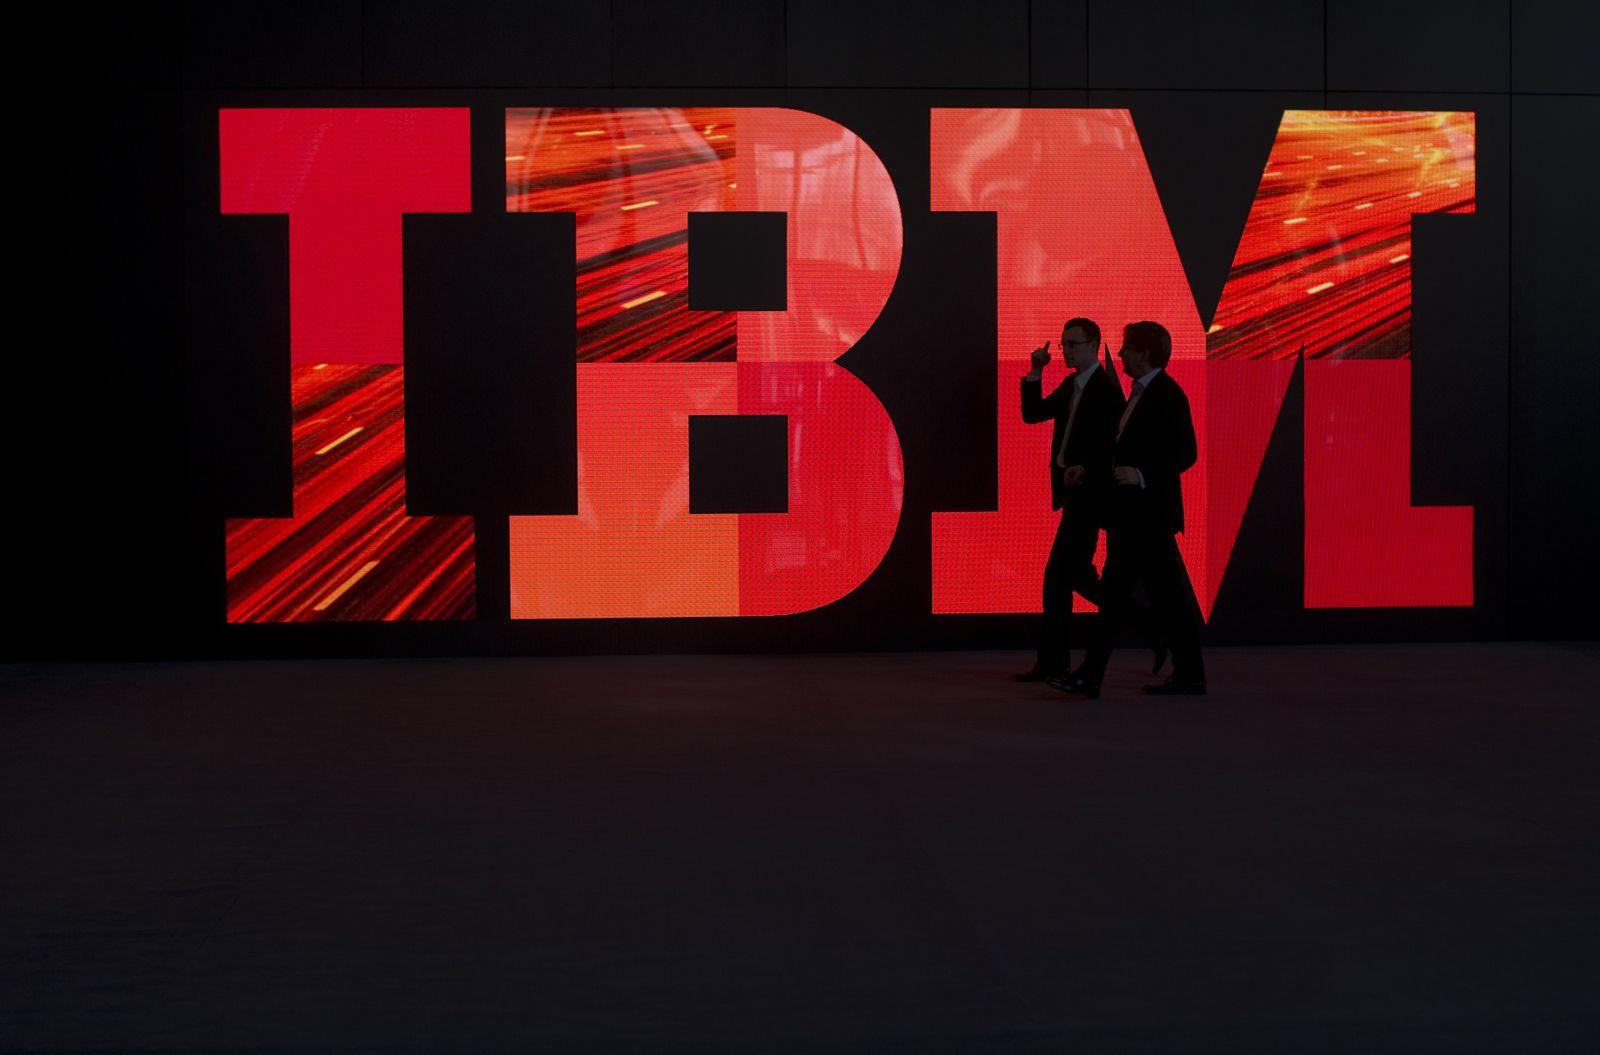 IBM / CeBIT